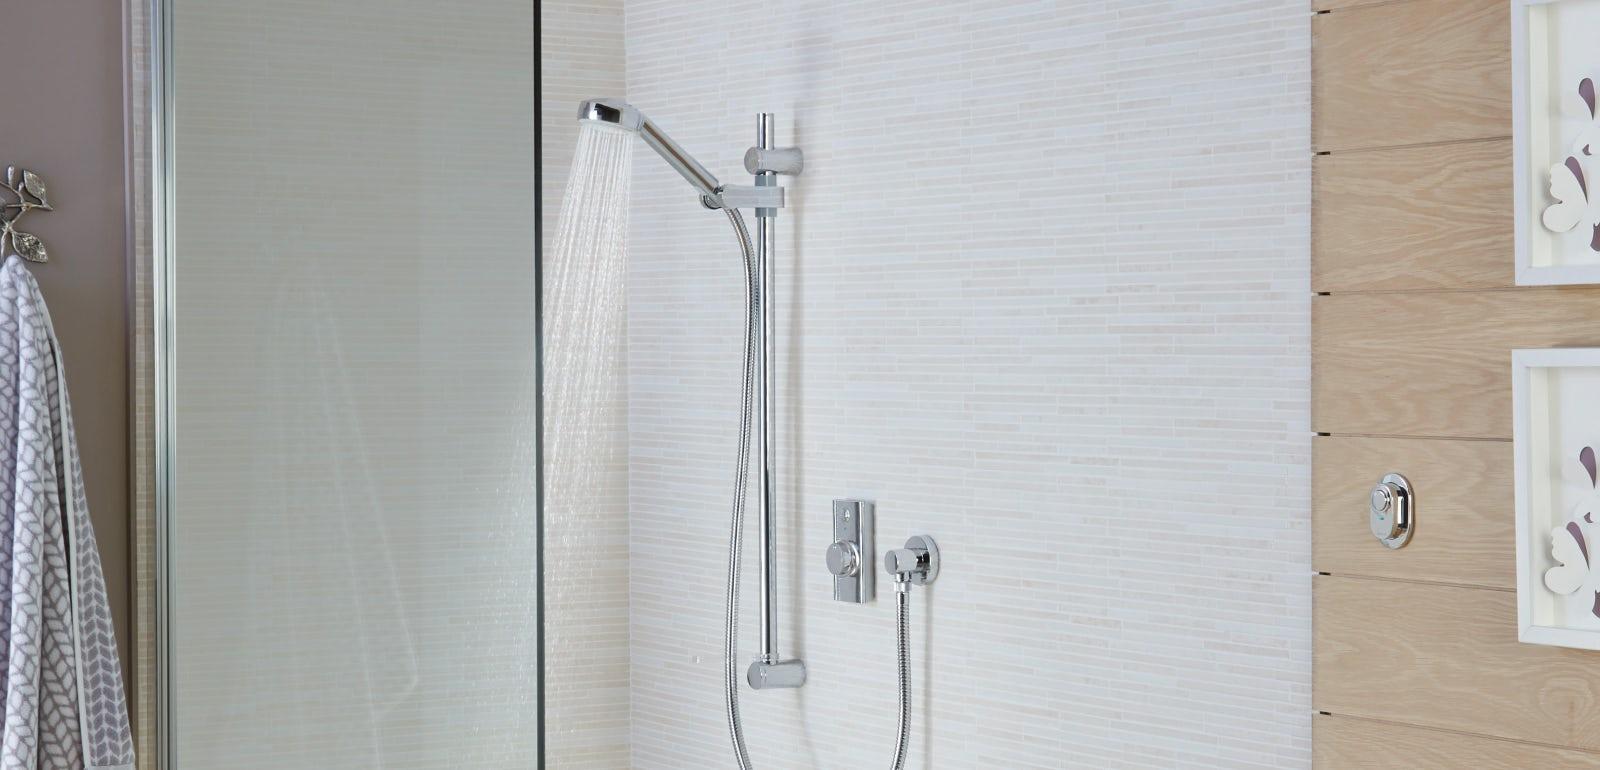 Digital Showers From Aqualisa